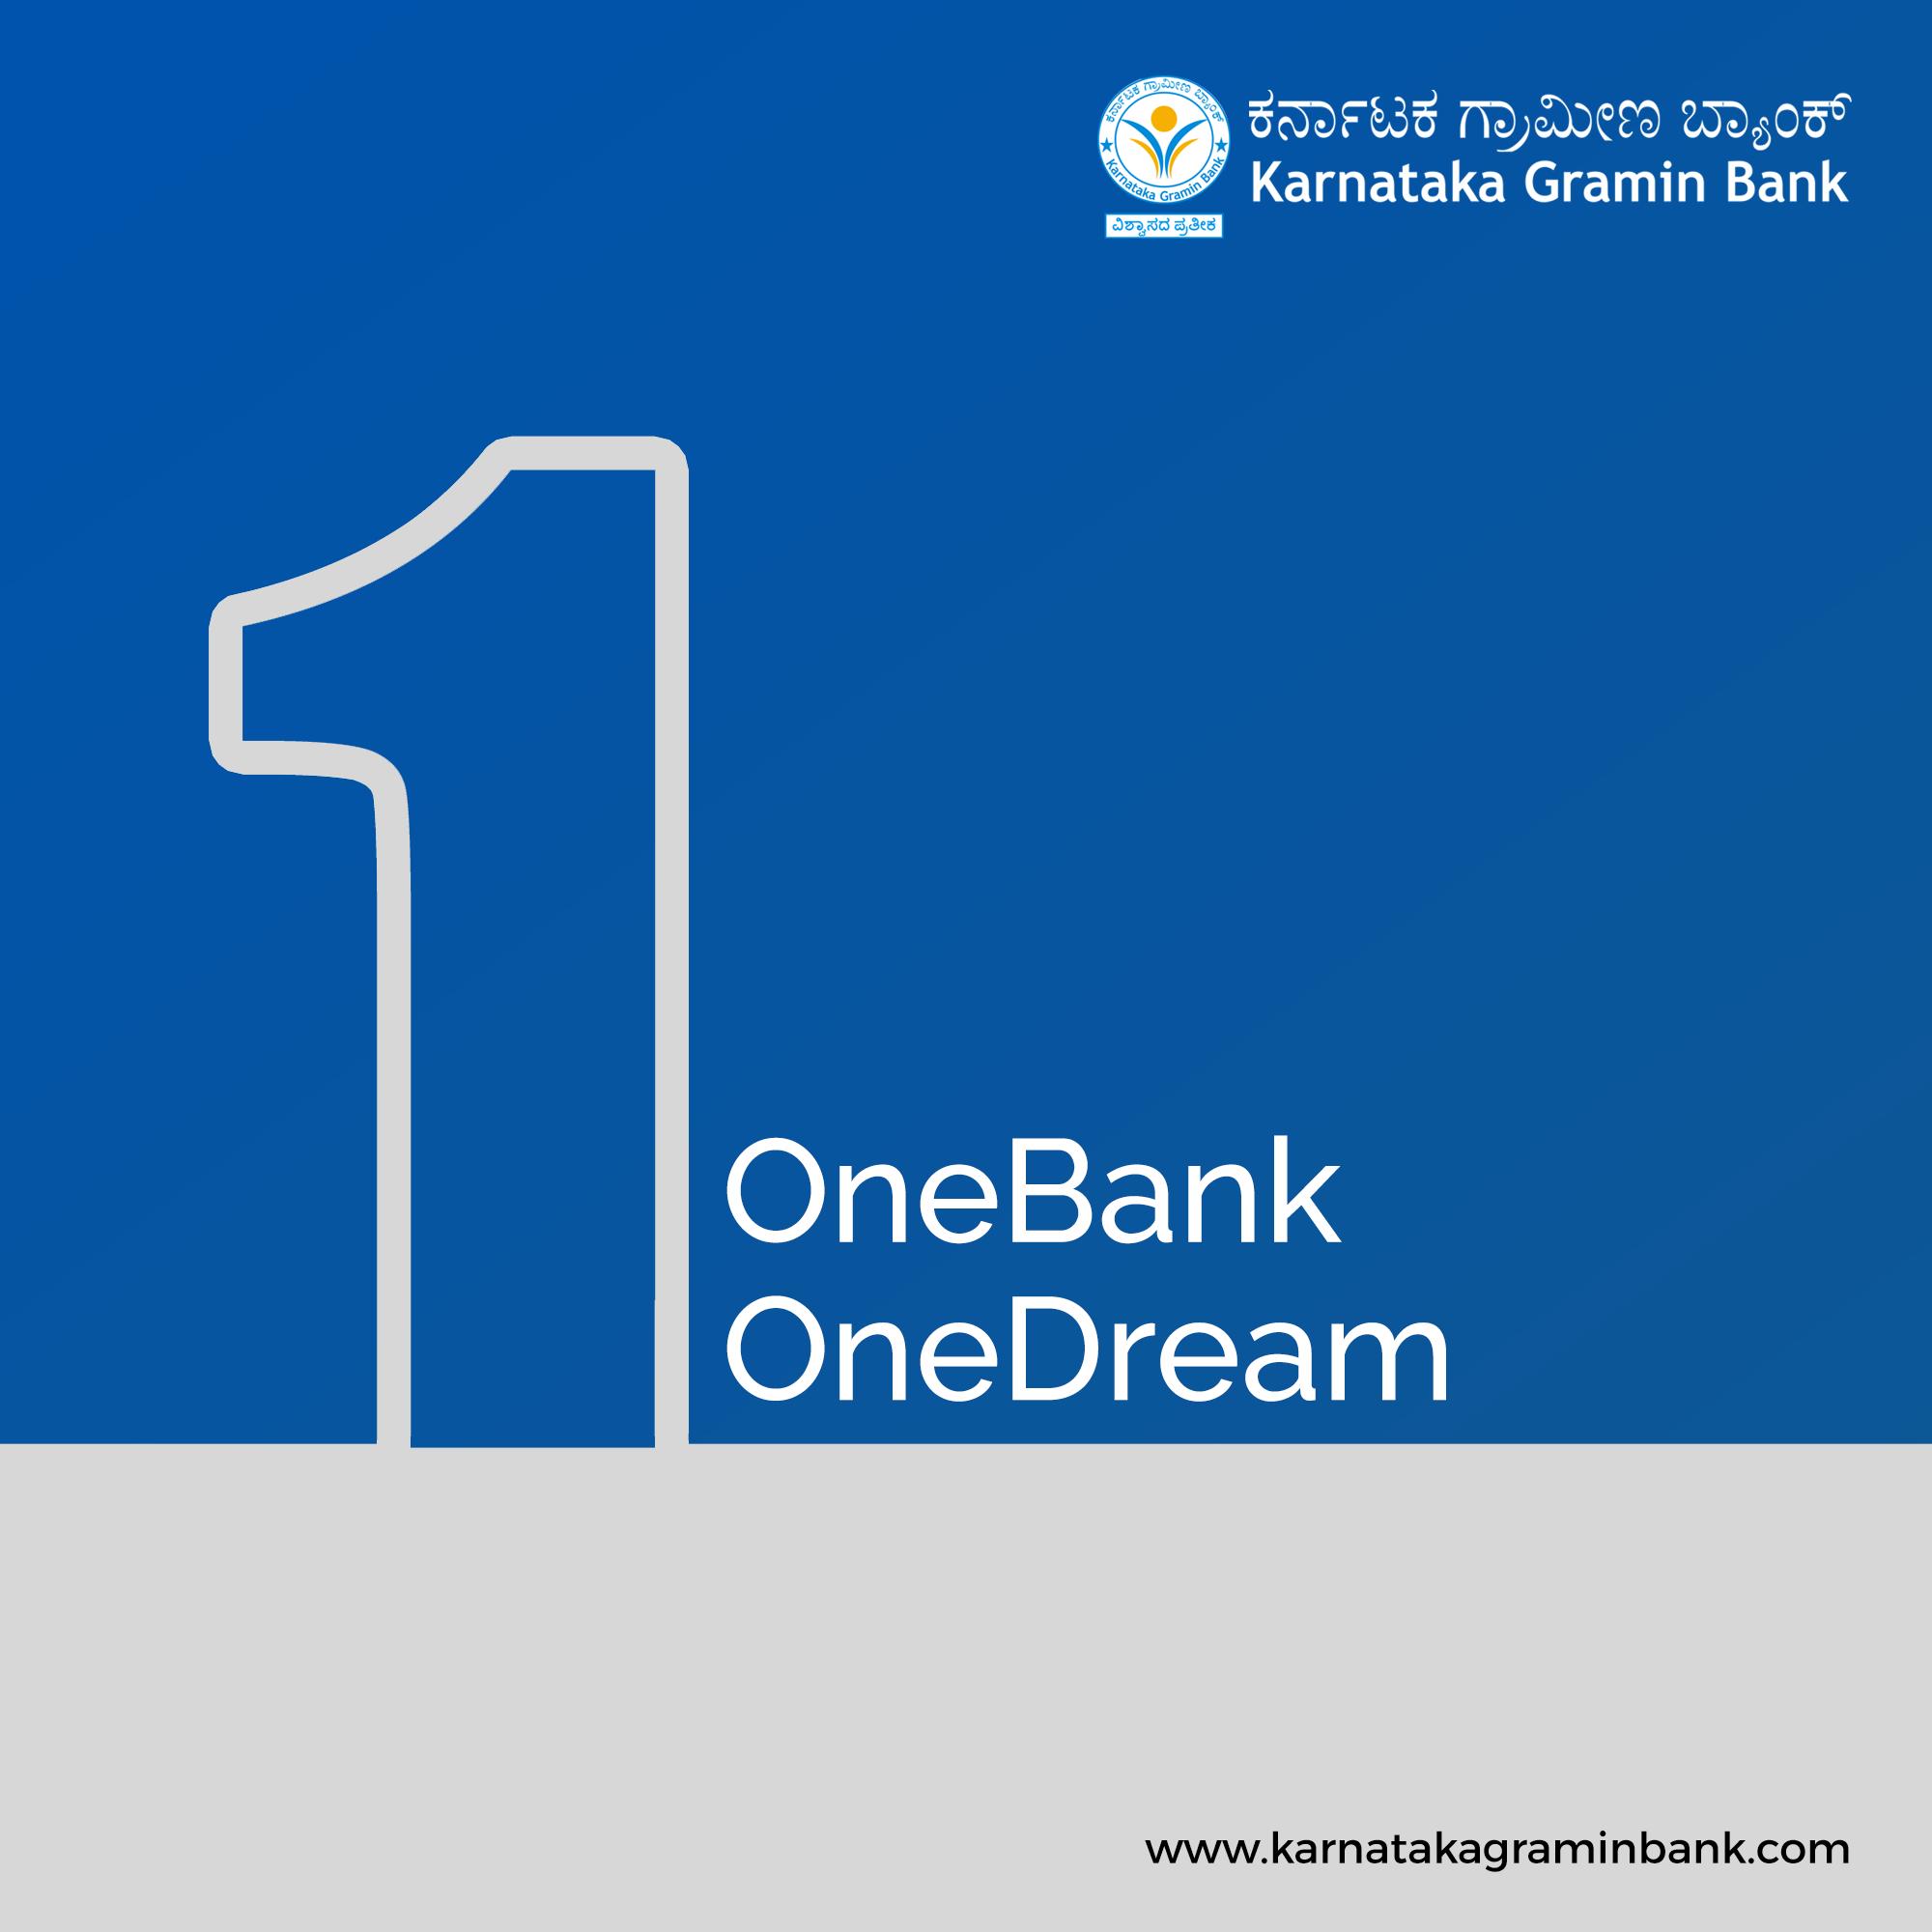 Karnataka Gramin Bank Is Now Bigger And Better The Biggest Rrb Of The Country One Bank One Dream Kgb Karnatakag Karnataka Mobile Banking Business Loans